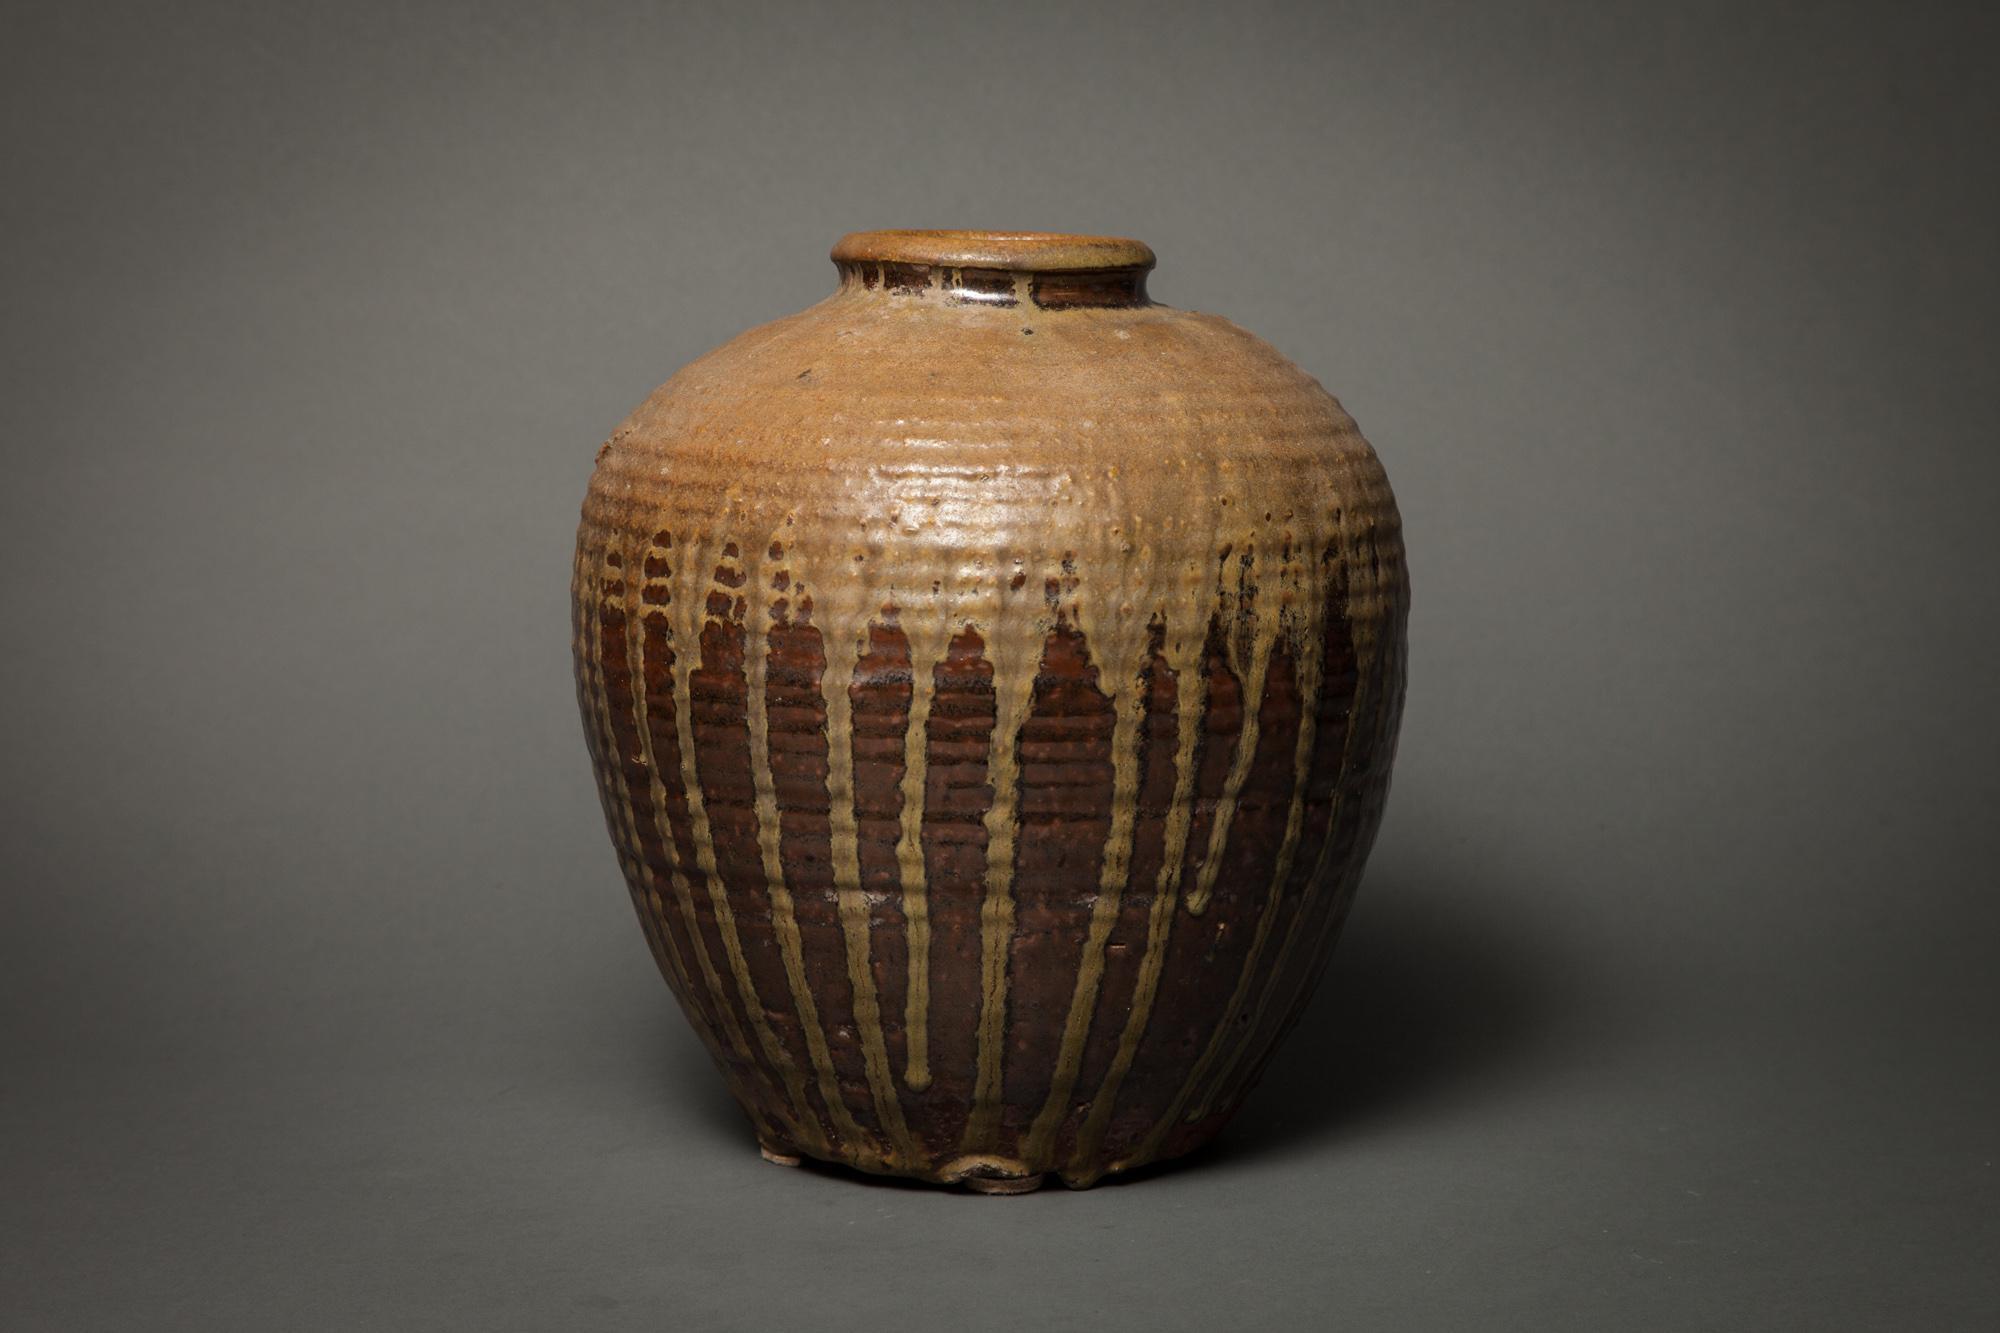 Chinese Ash-Fired Storage Jar